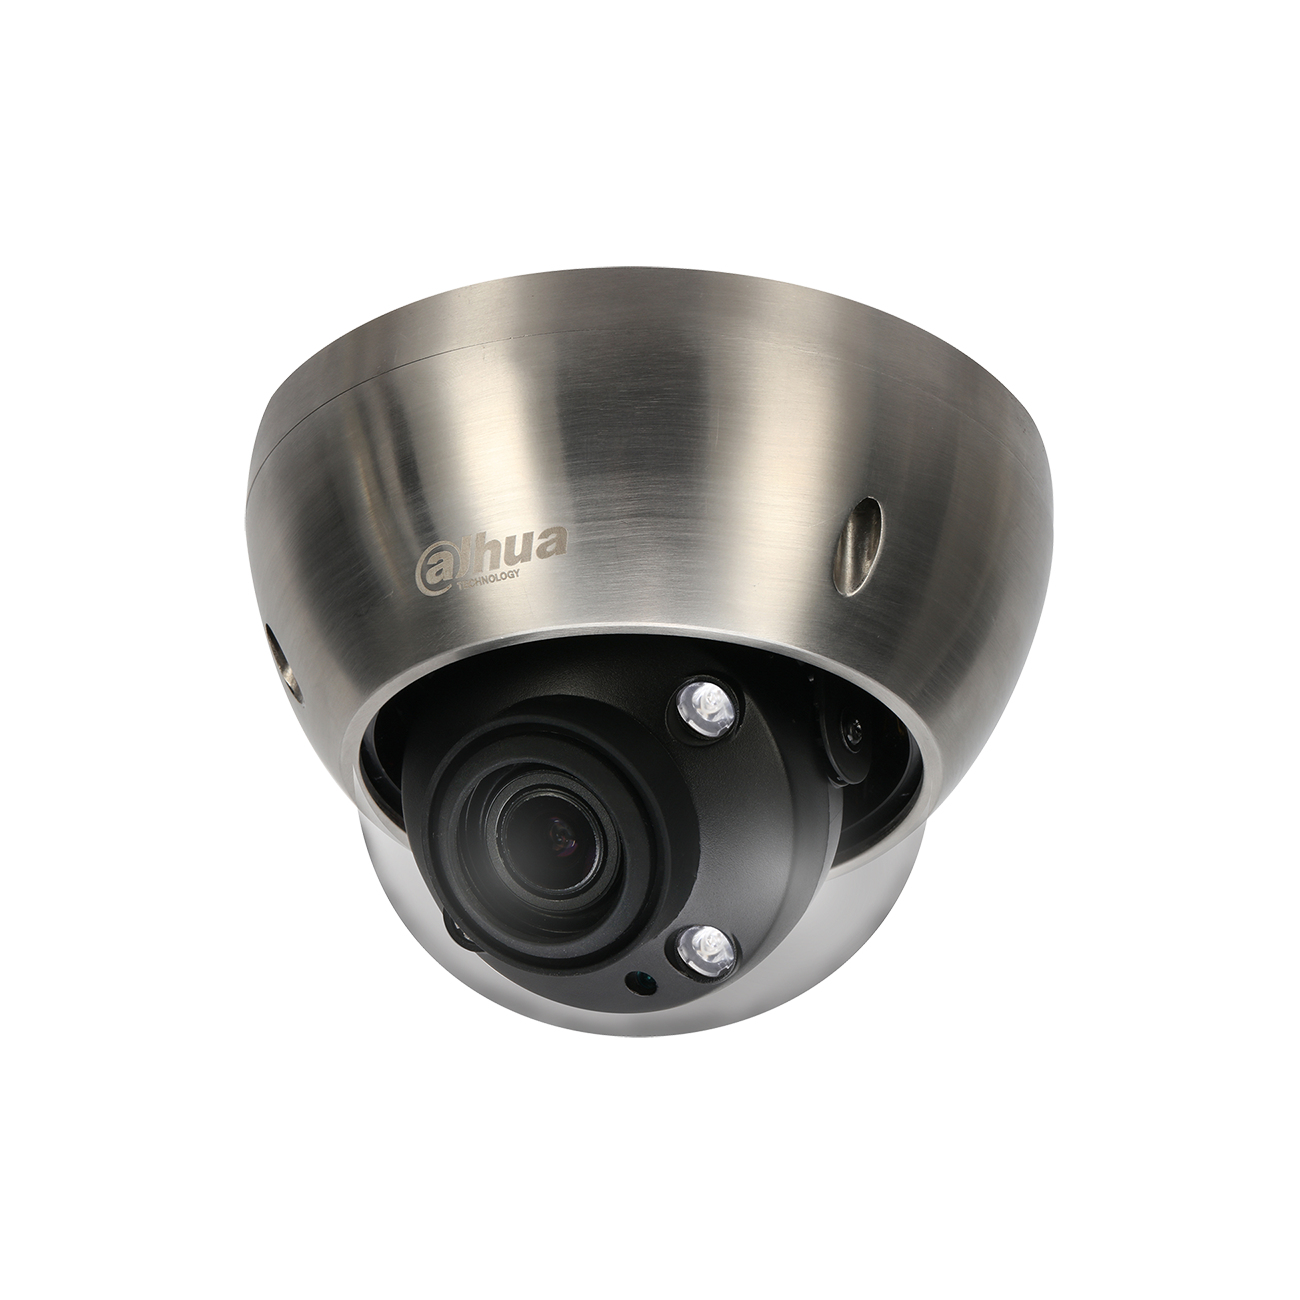 Dahua Europe Ultra IPC-HDBW8232E-Z-SL security camera IP security camera Outdoor Dome Ceiling 1920 x 1080 pixels